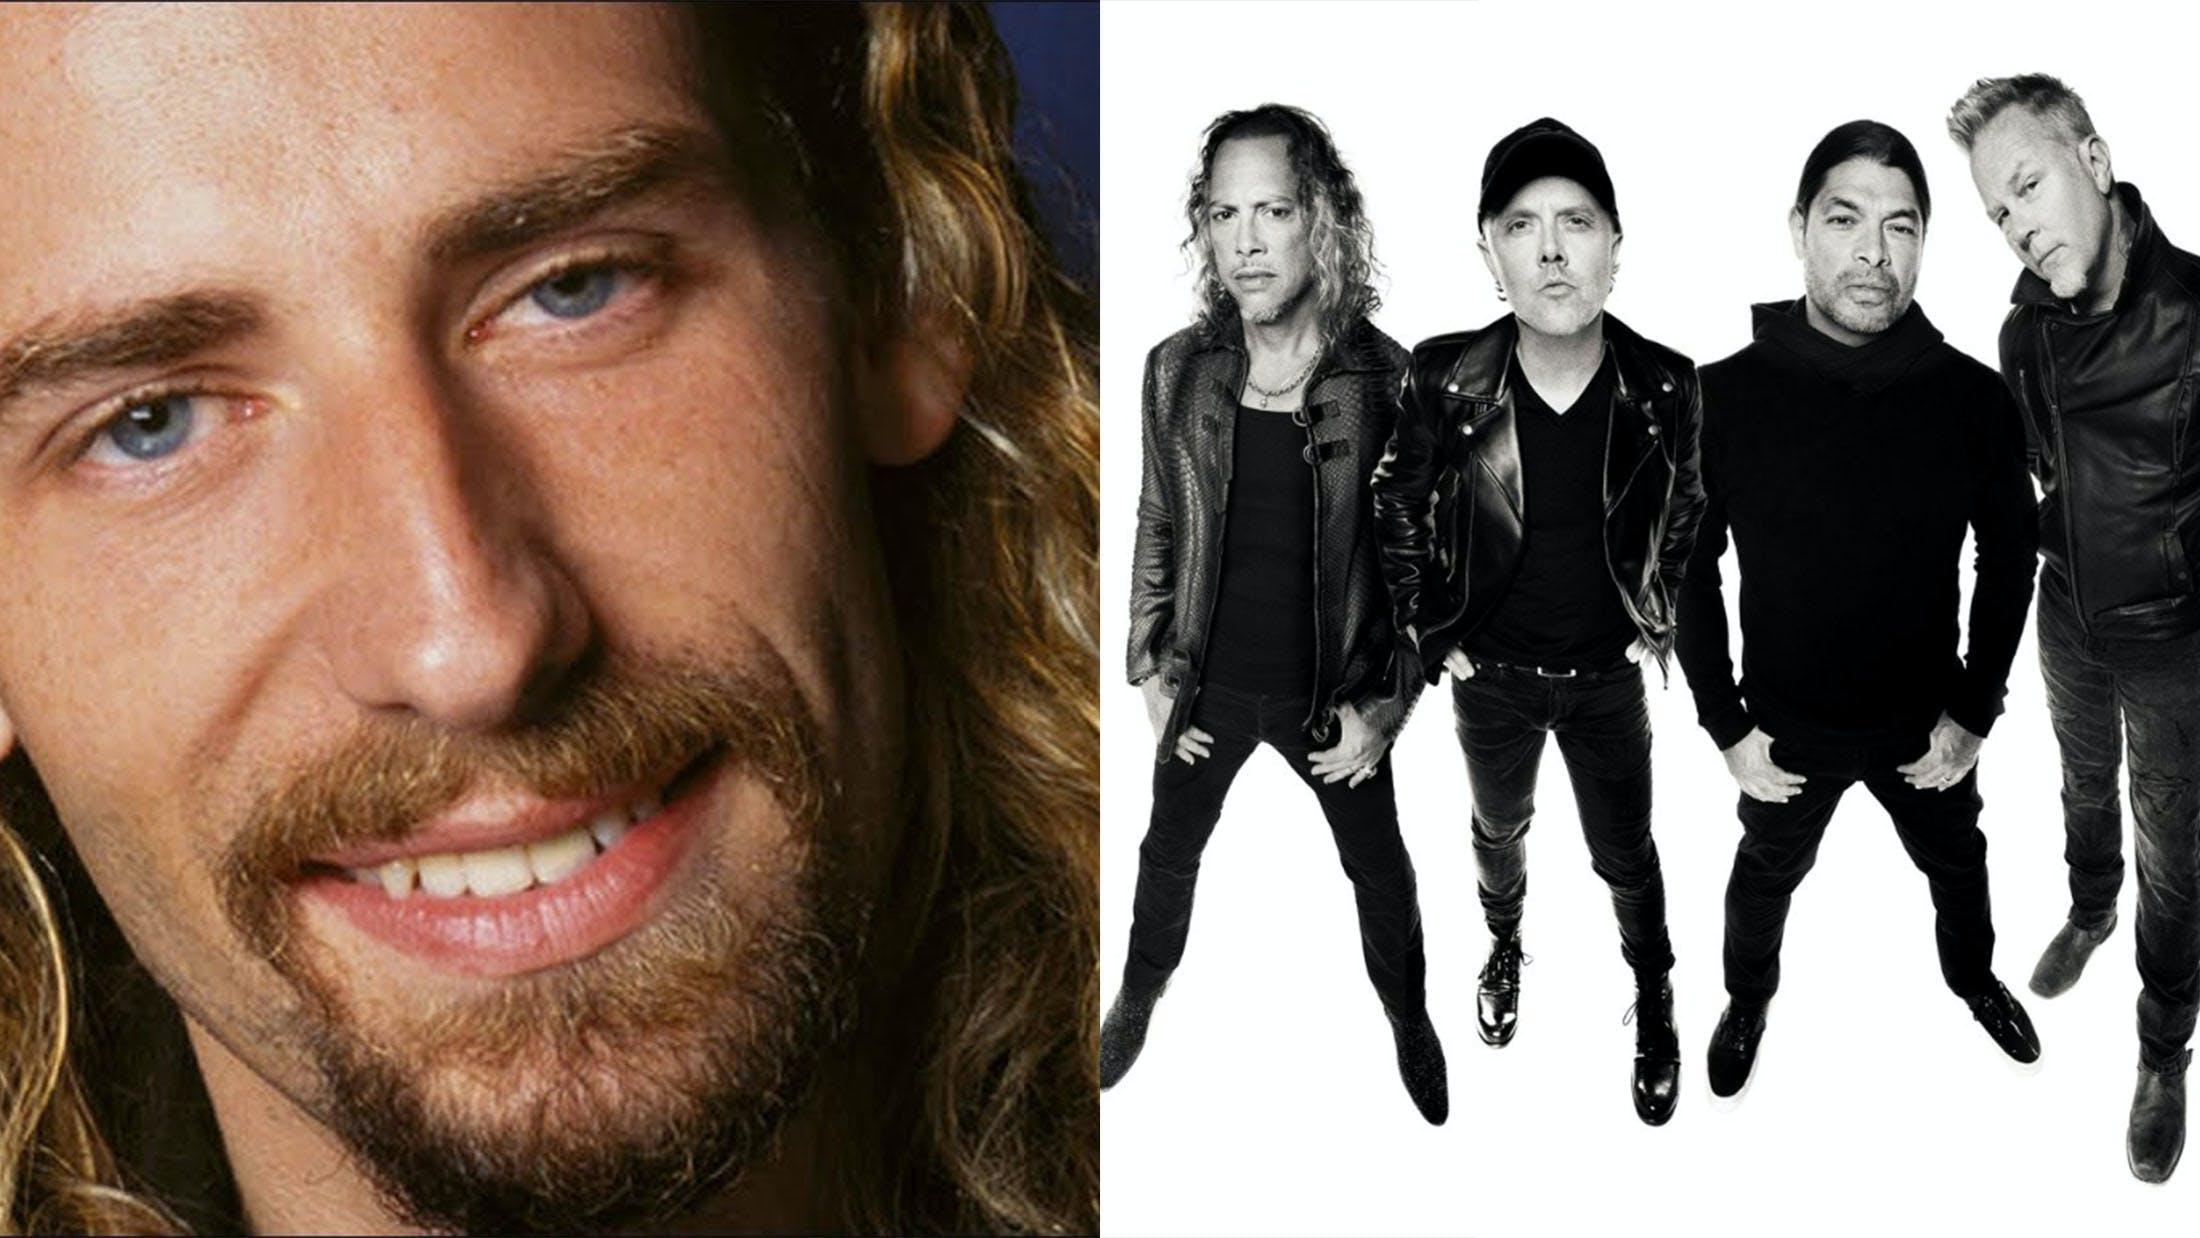 Chad Nickelback Metallica